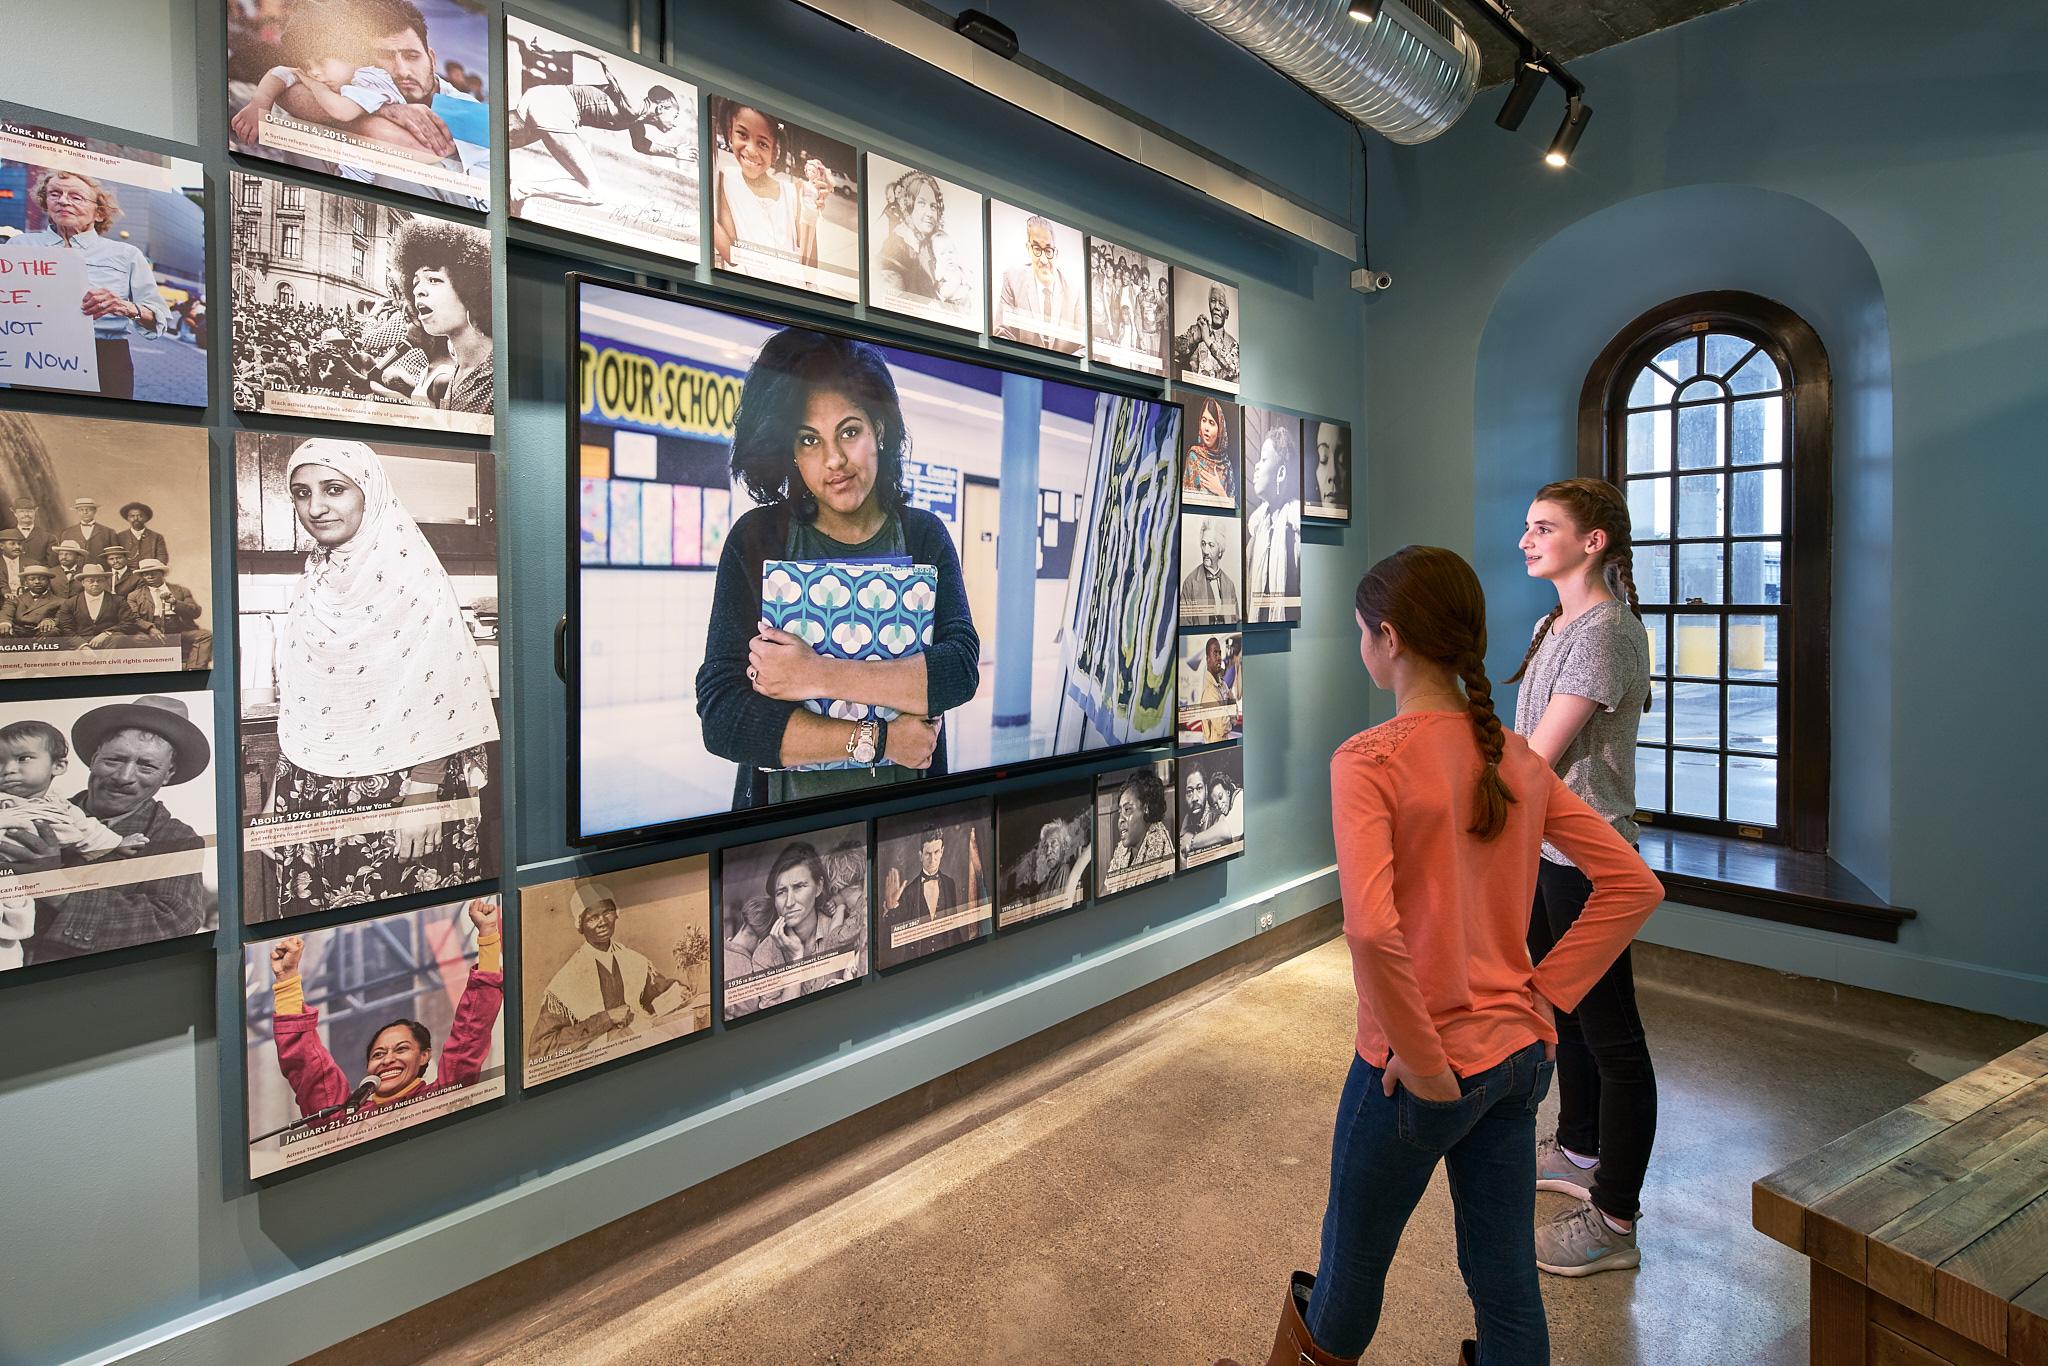 Niagara Falls Underground Railroad Heritage Center Freedom Gallery (Photo: Kim Smith)